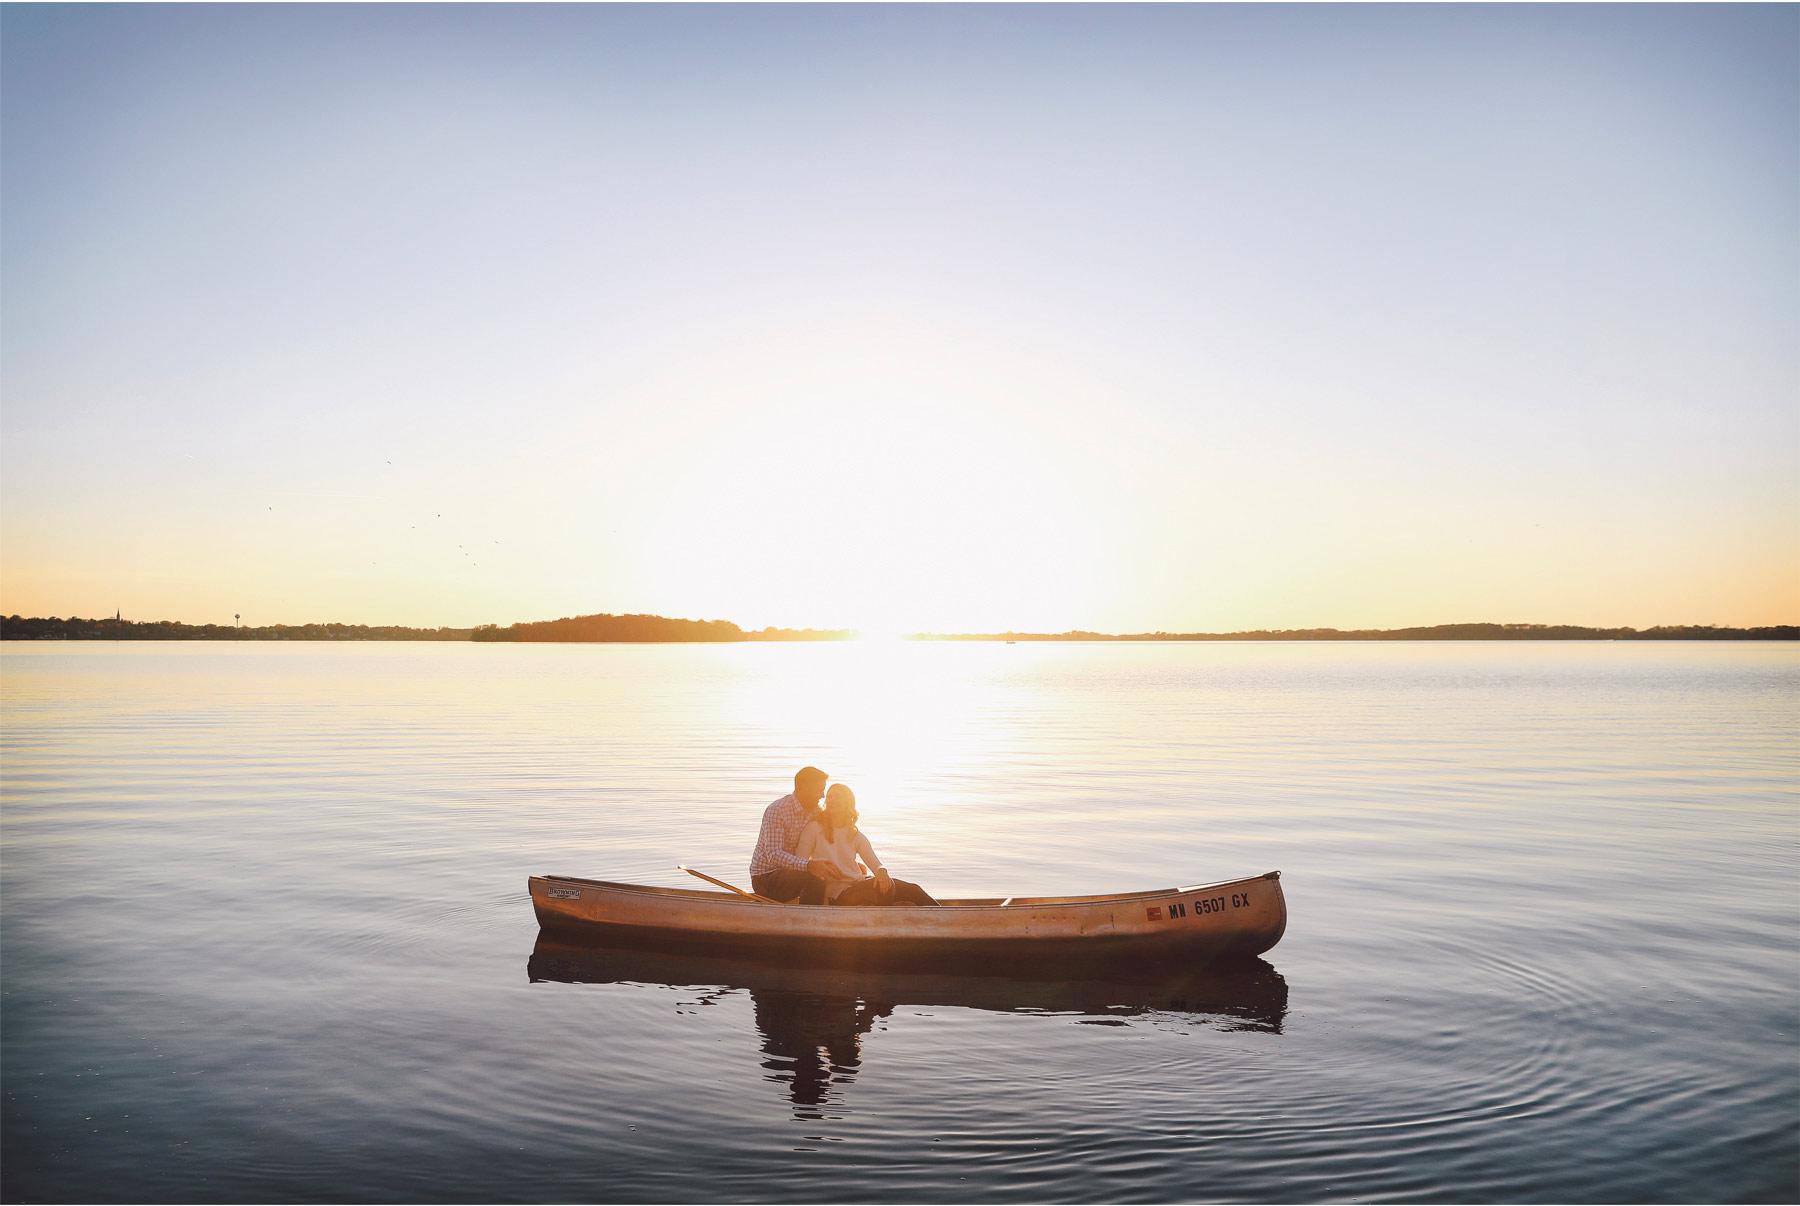 14-Vick-Photography-Destination-Engagement-Session-Canoe-Lake-Sunset-Katie-and-Bob.jpg